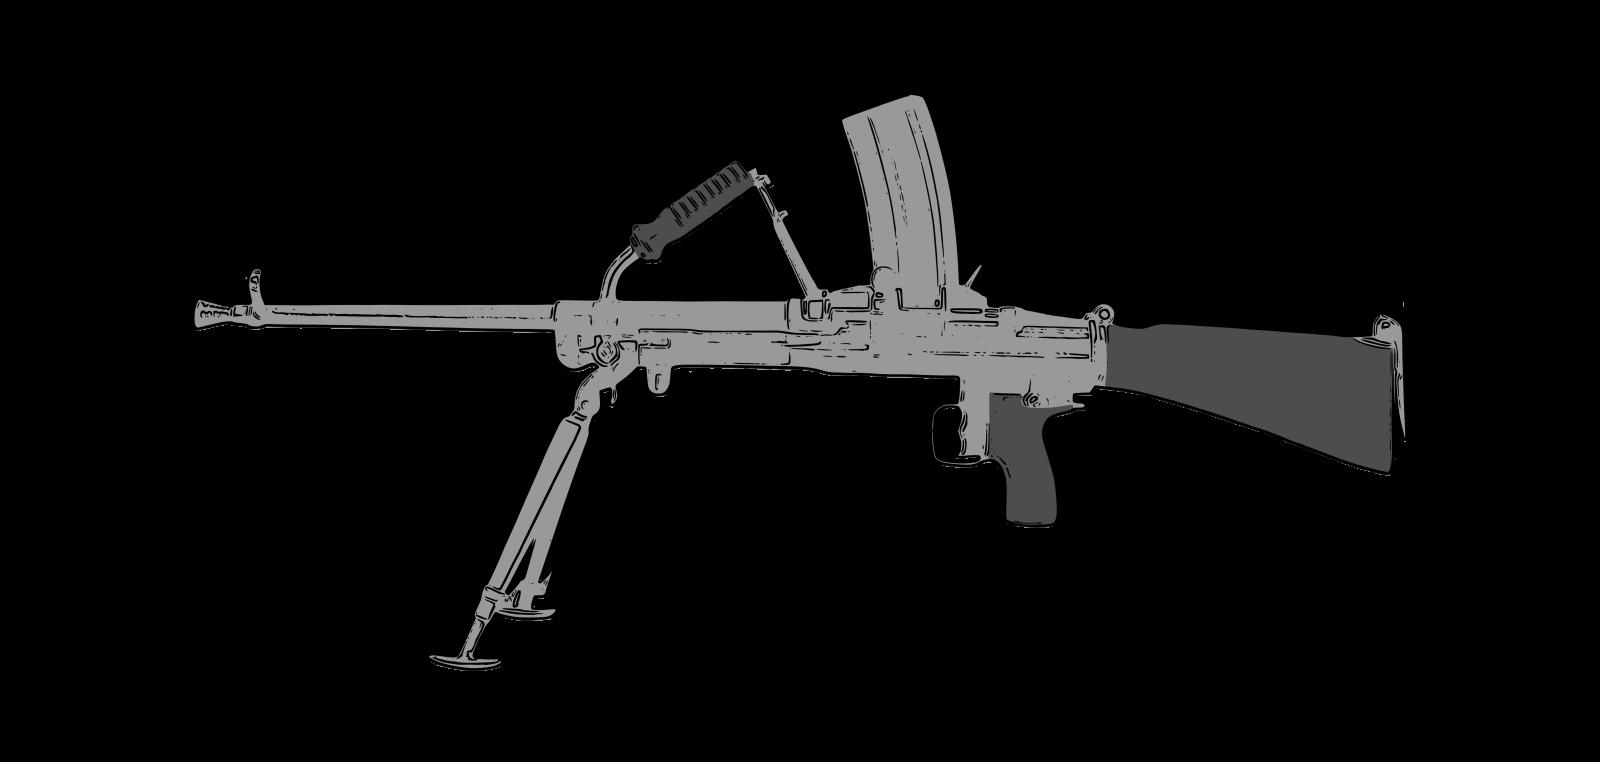 how to get a machine gun license